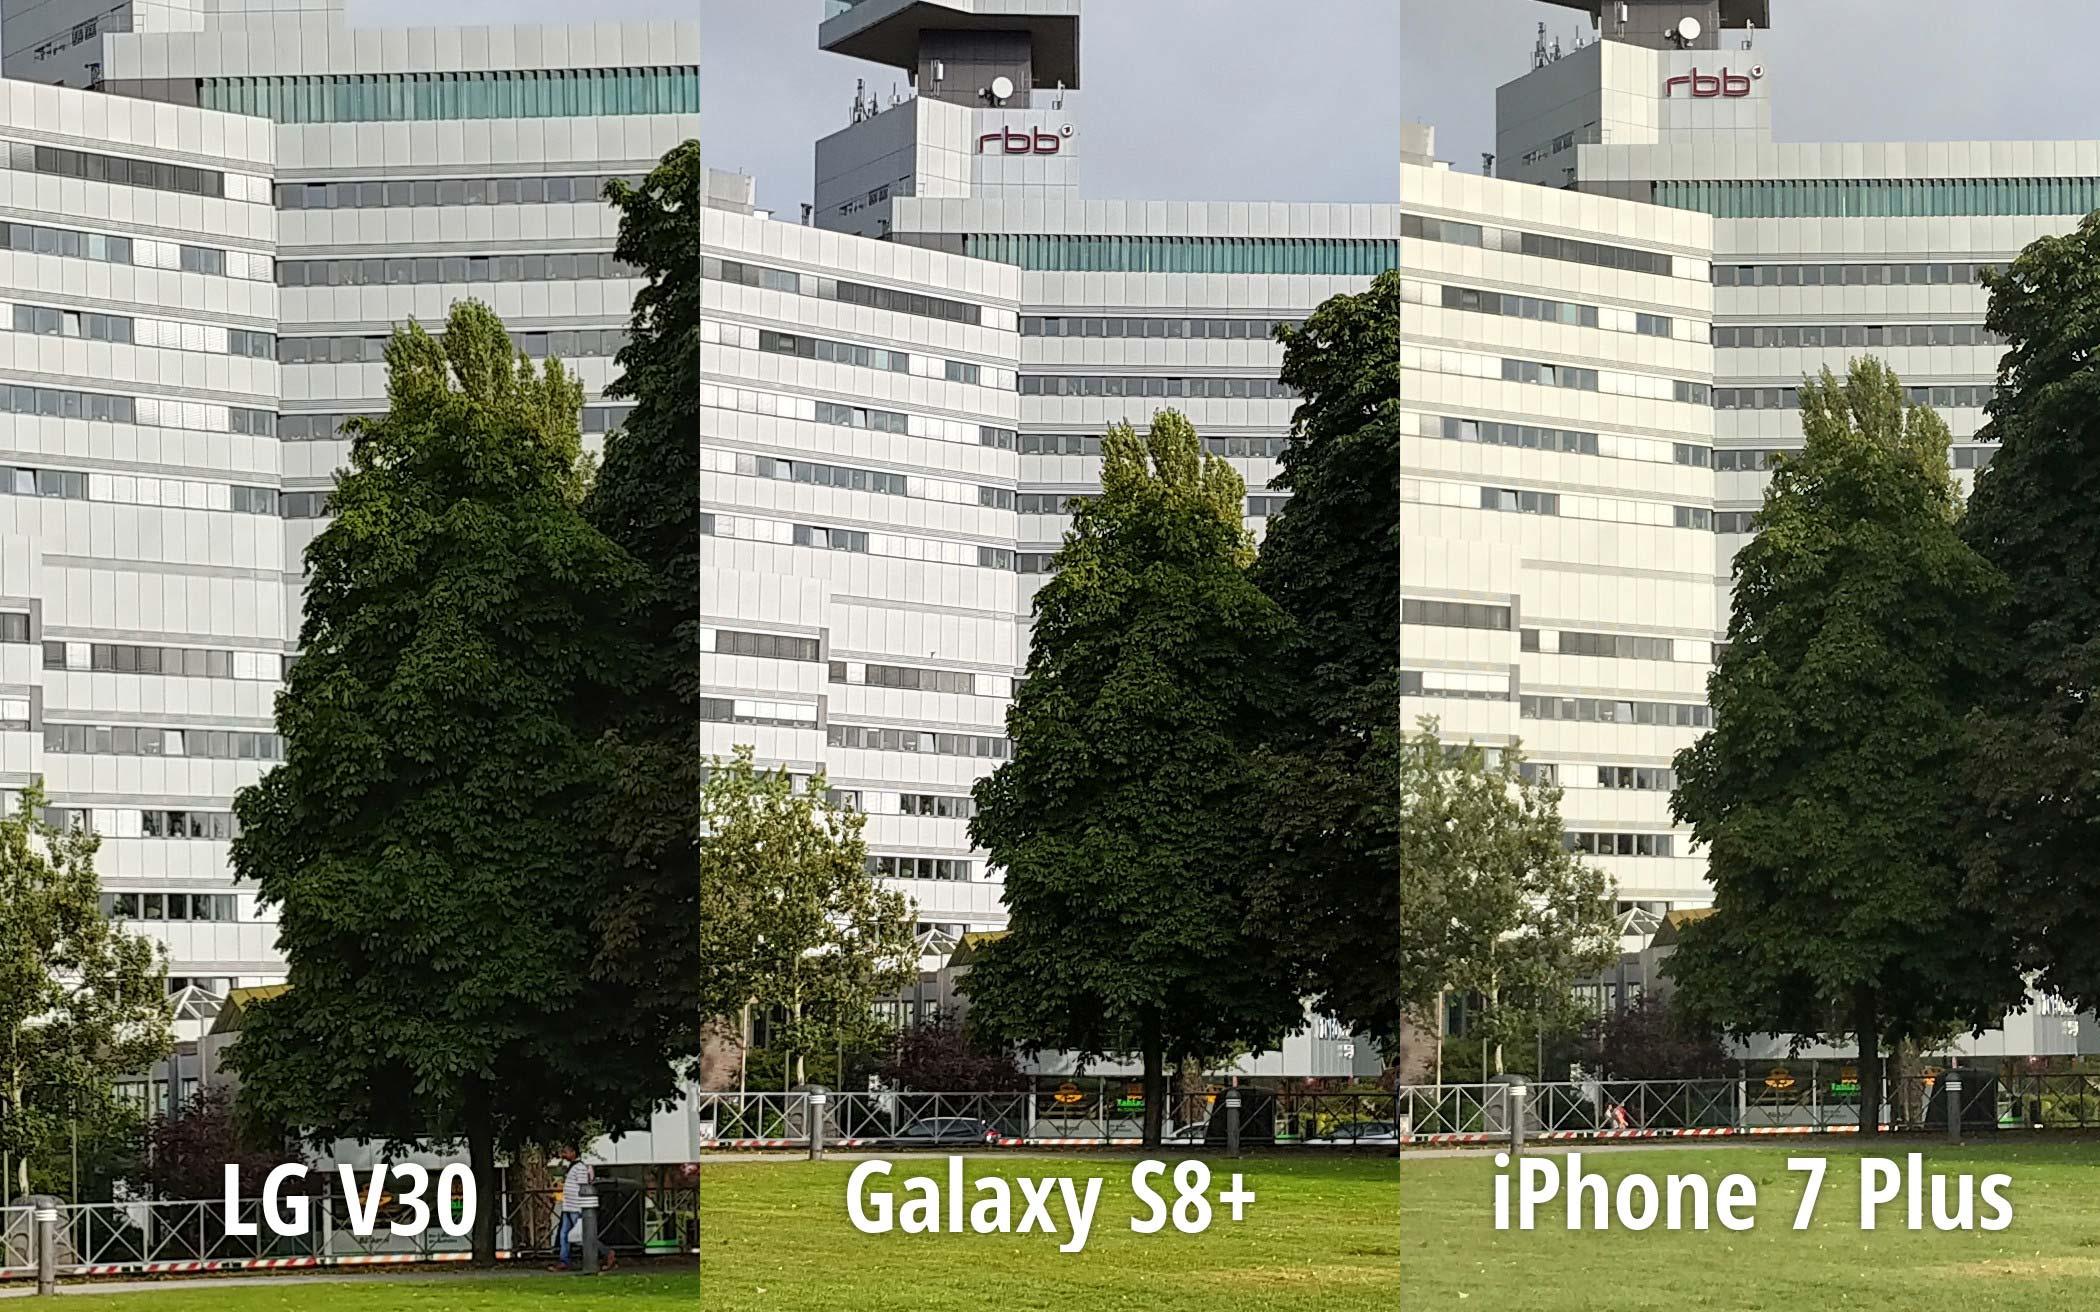 LG-V30-vs-Galaxy-S8-vs-iPhone-7-Plus-camera-photo-samples-(2).jpg